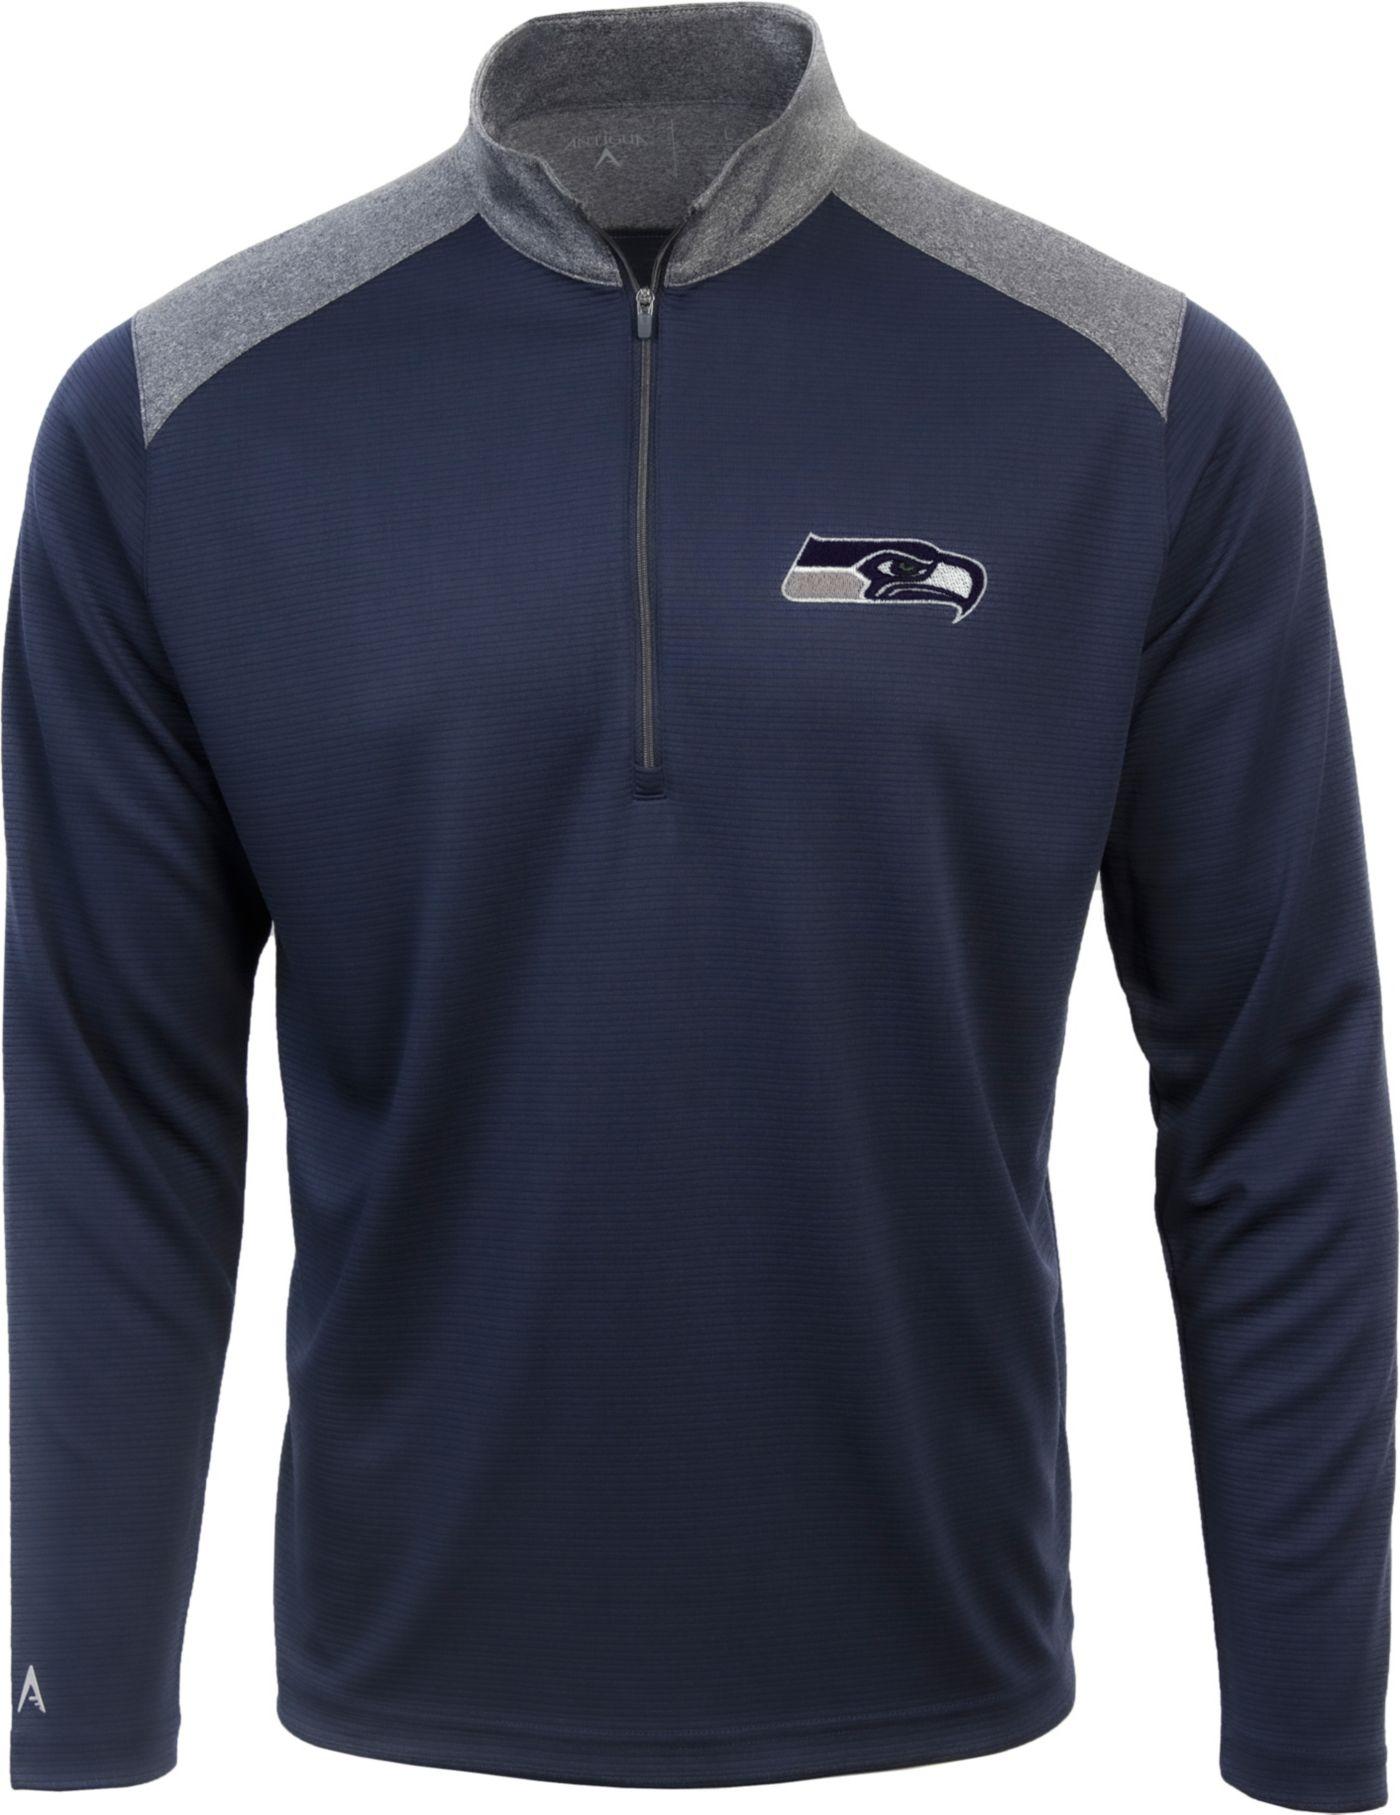 Antigua Men's Seattle Seahawks Velocity Navy Quarter-Zip Pullover